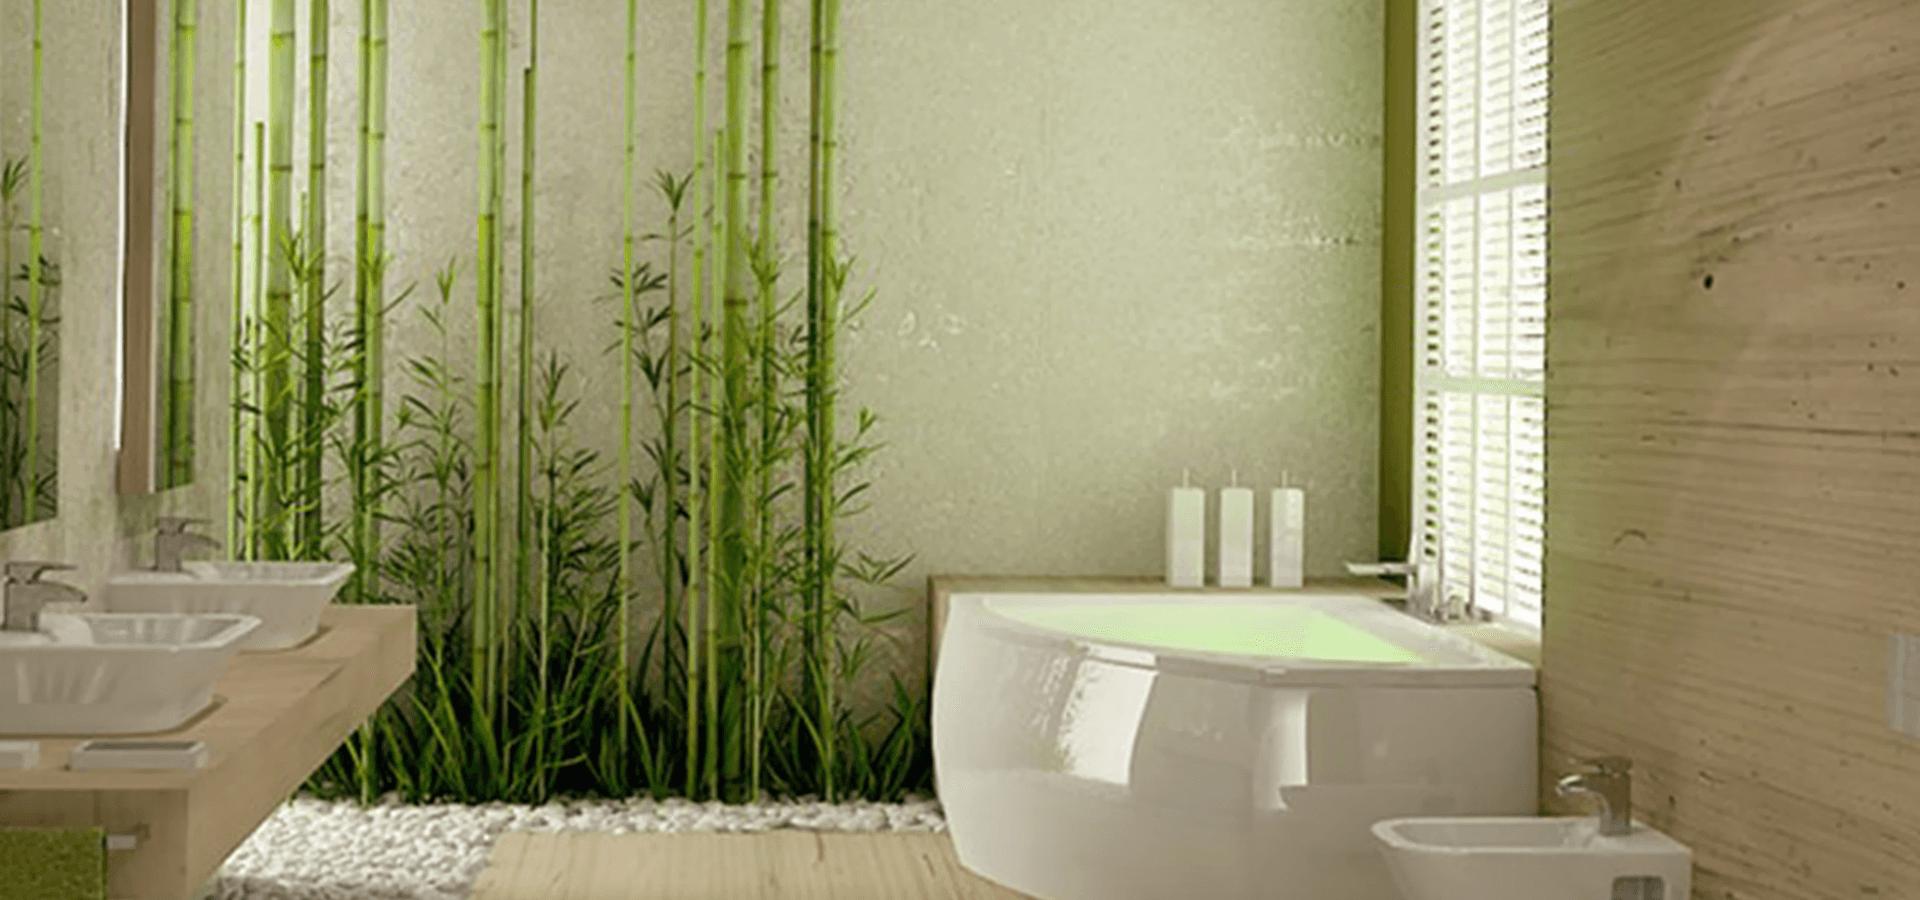 A stunning bathroom